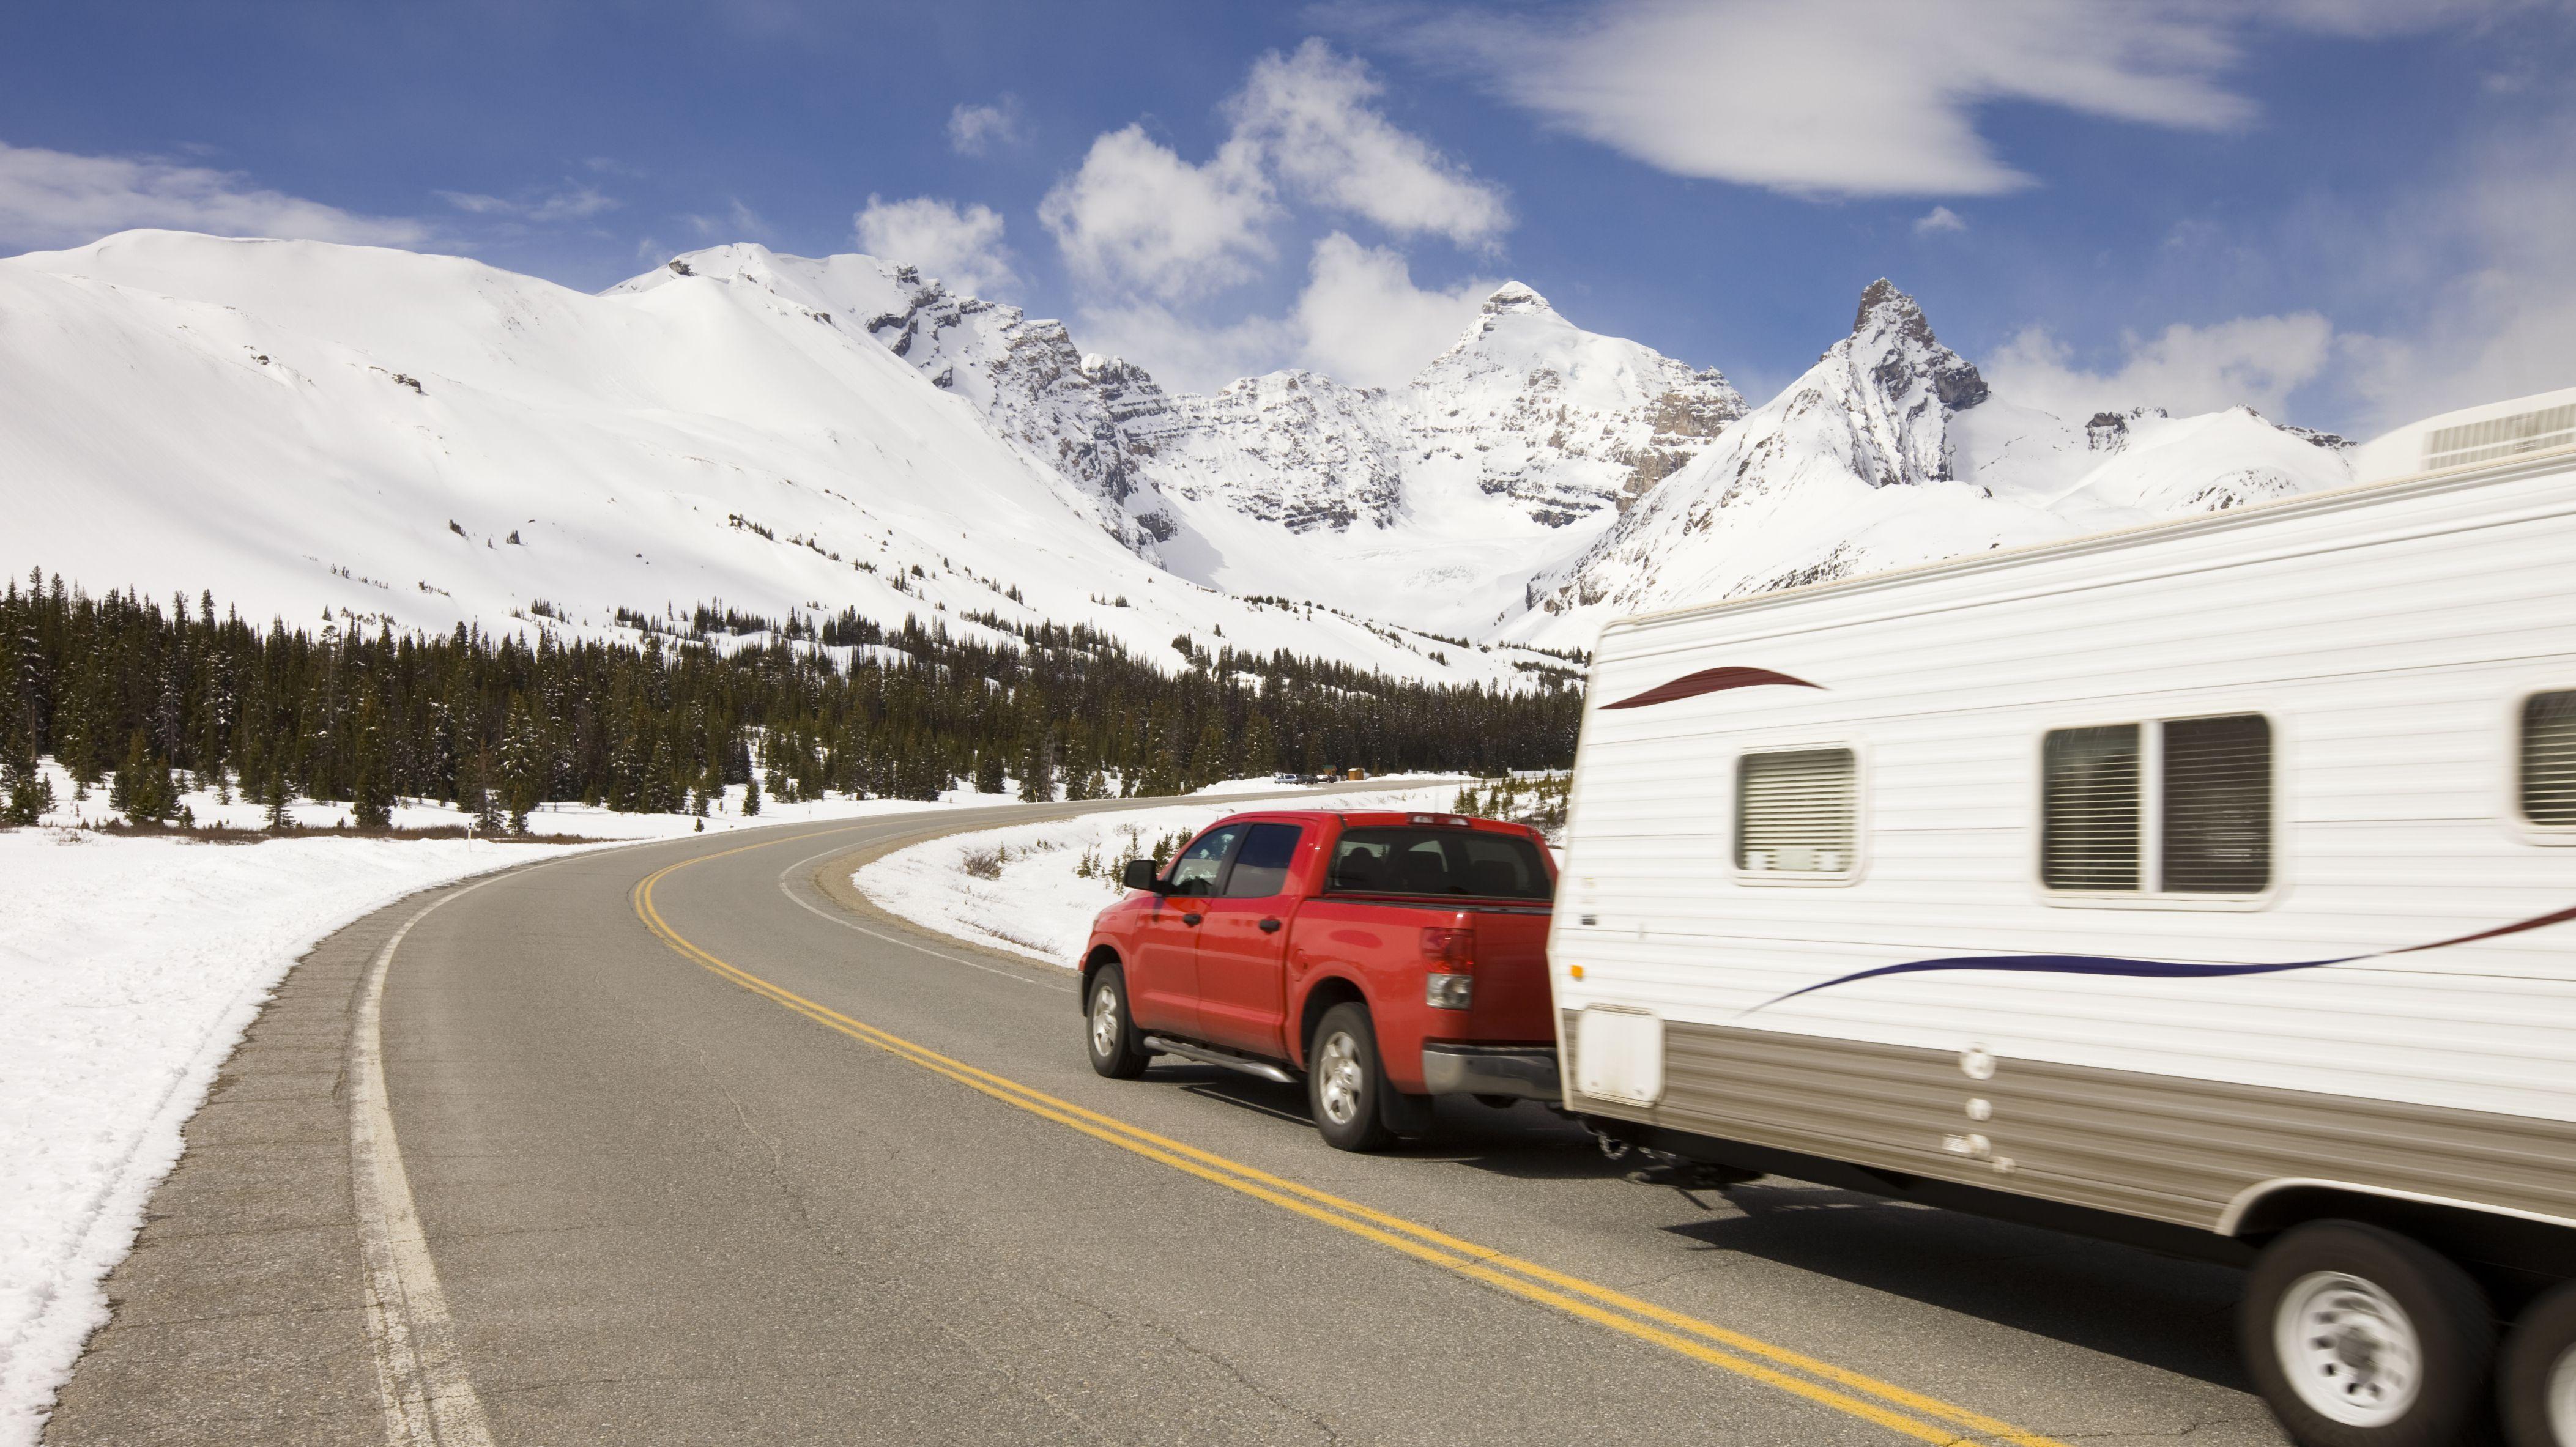 travel-trailers-56a817675f9b58b7d0f08bcd